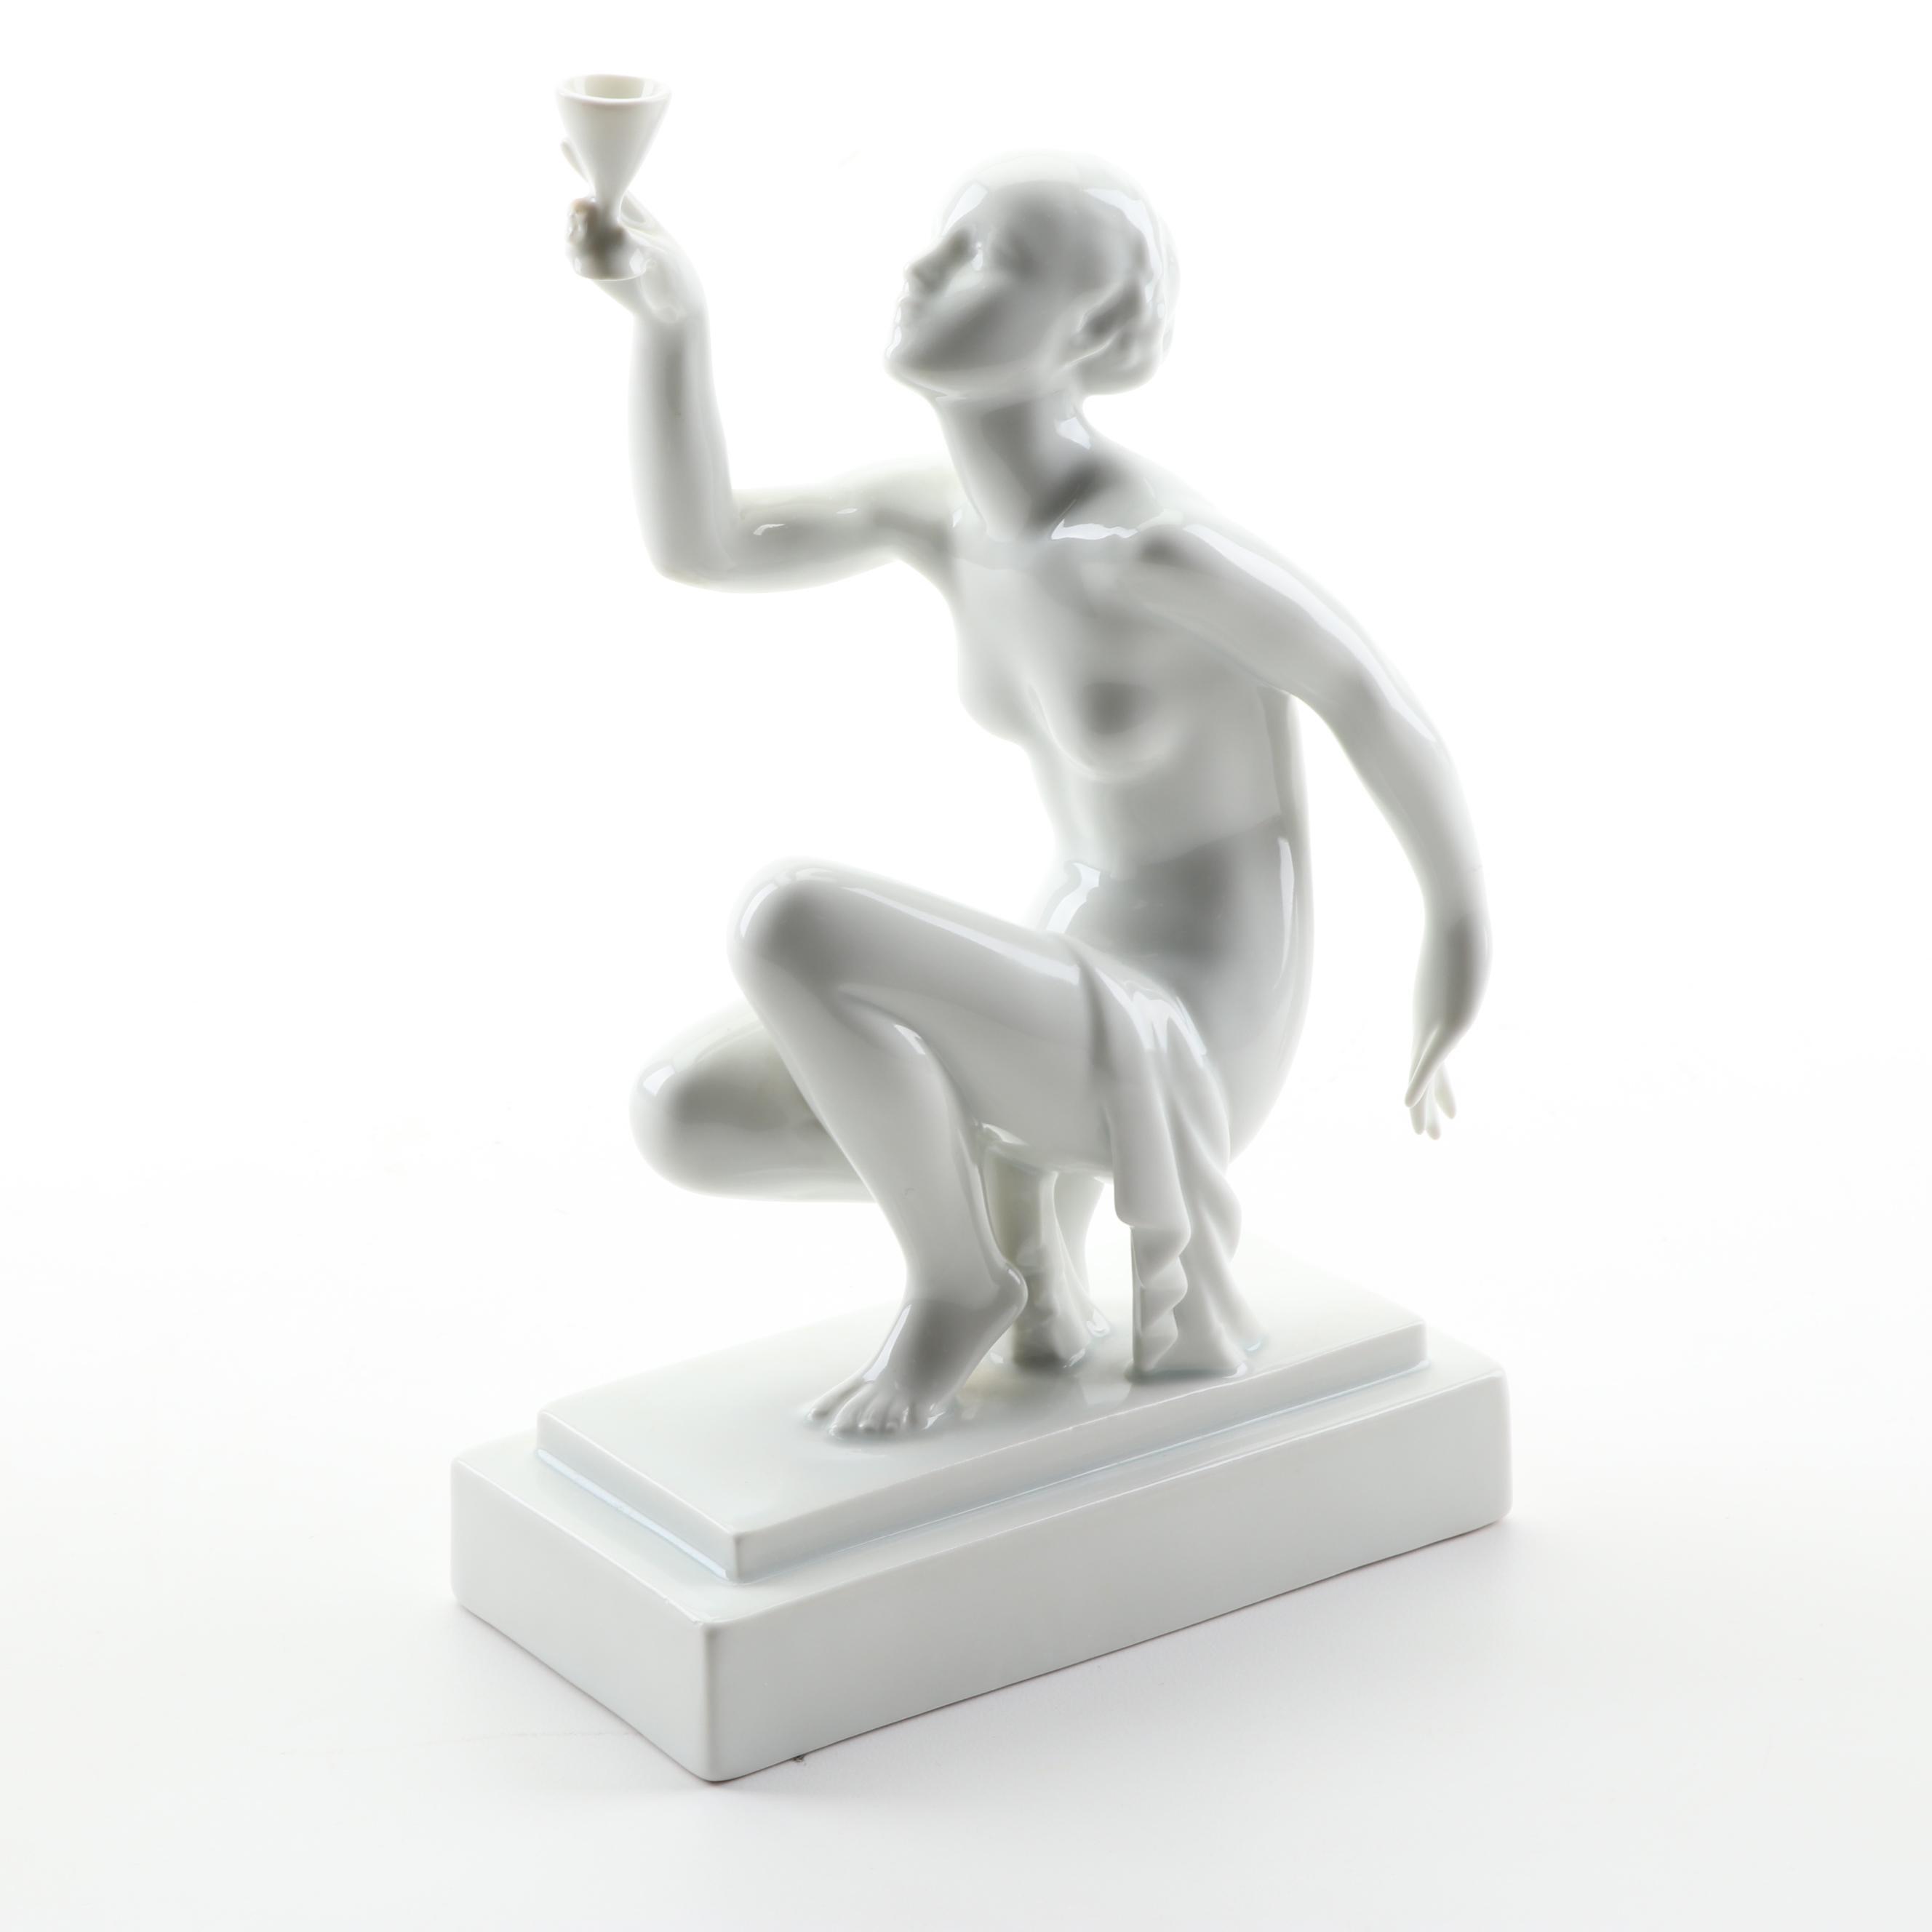 Herend Porcelain Art Deco Style Figurine